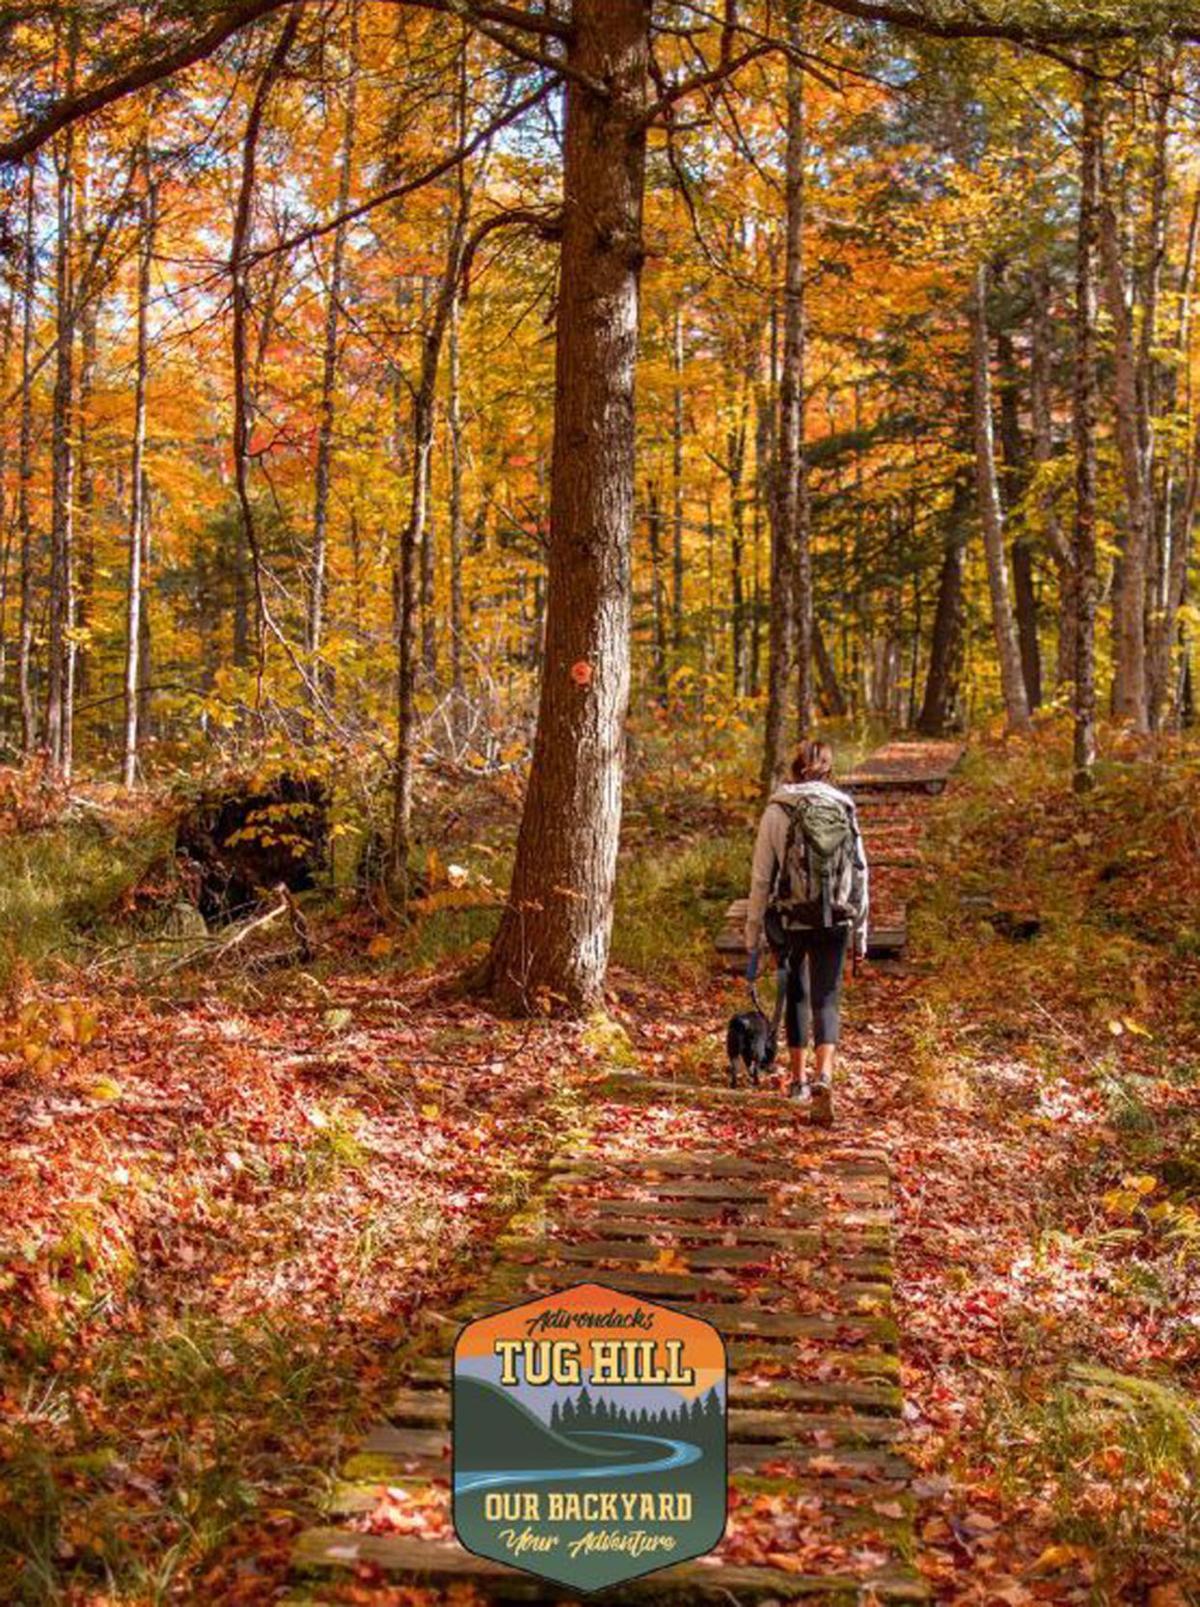 Lewis County fall foliage tour set for Saturday